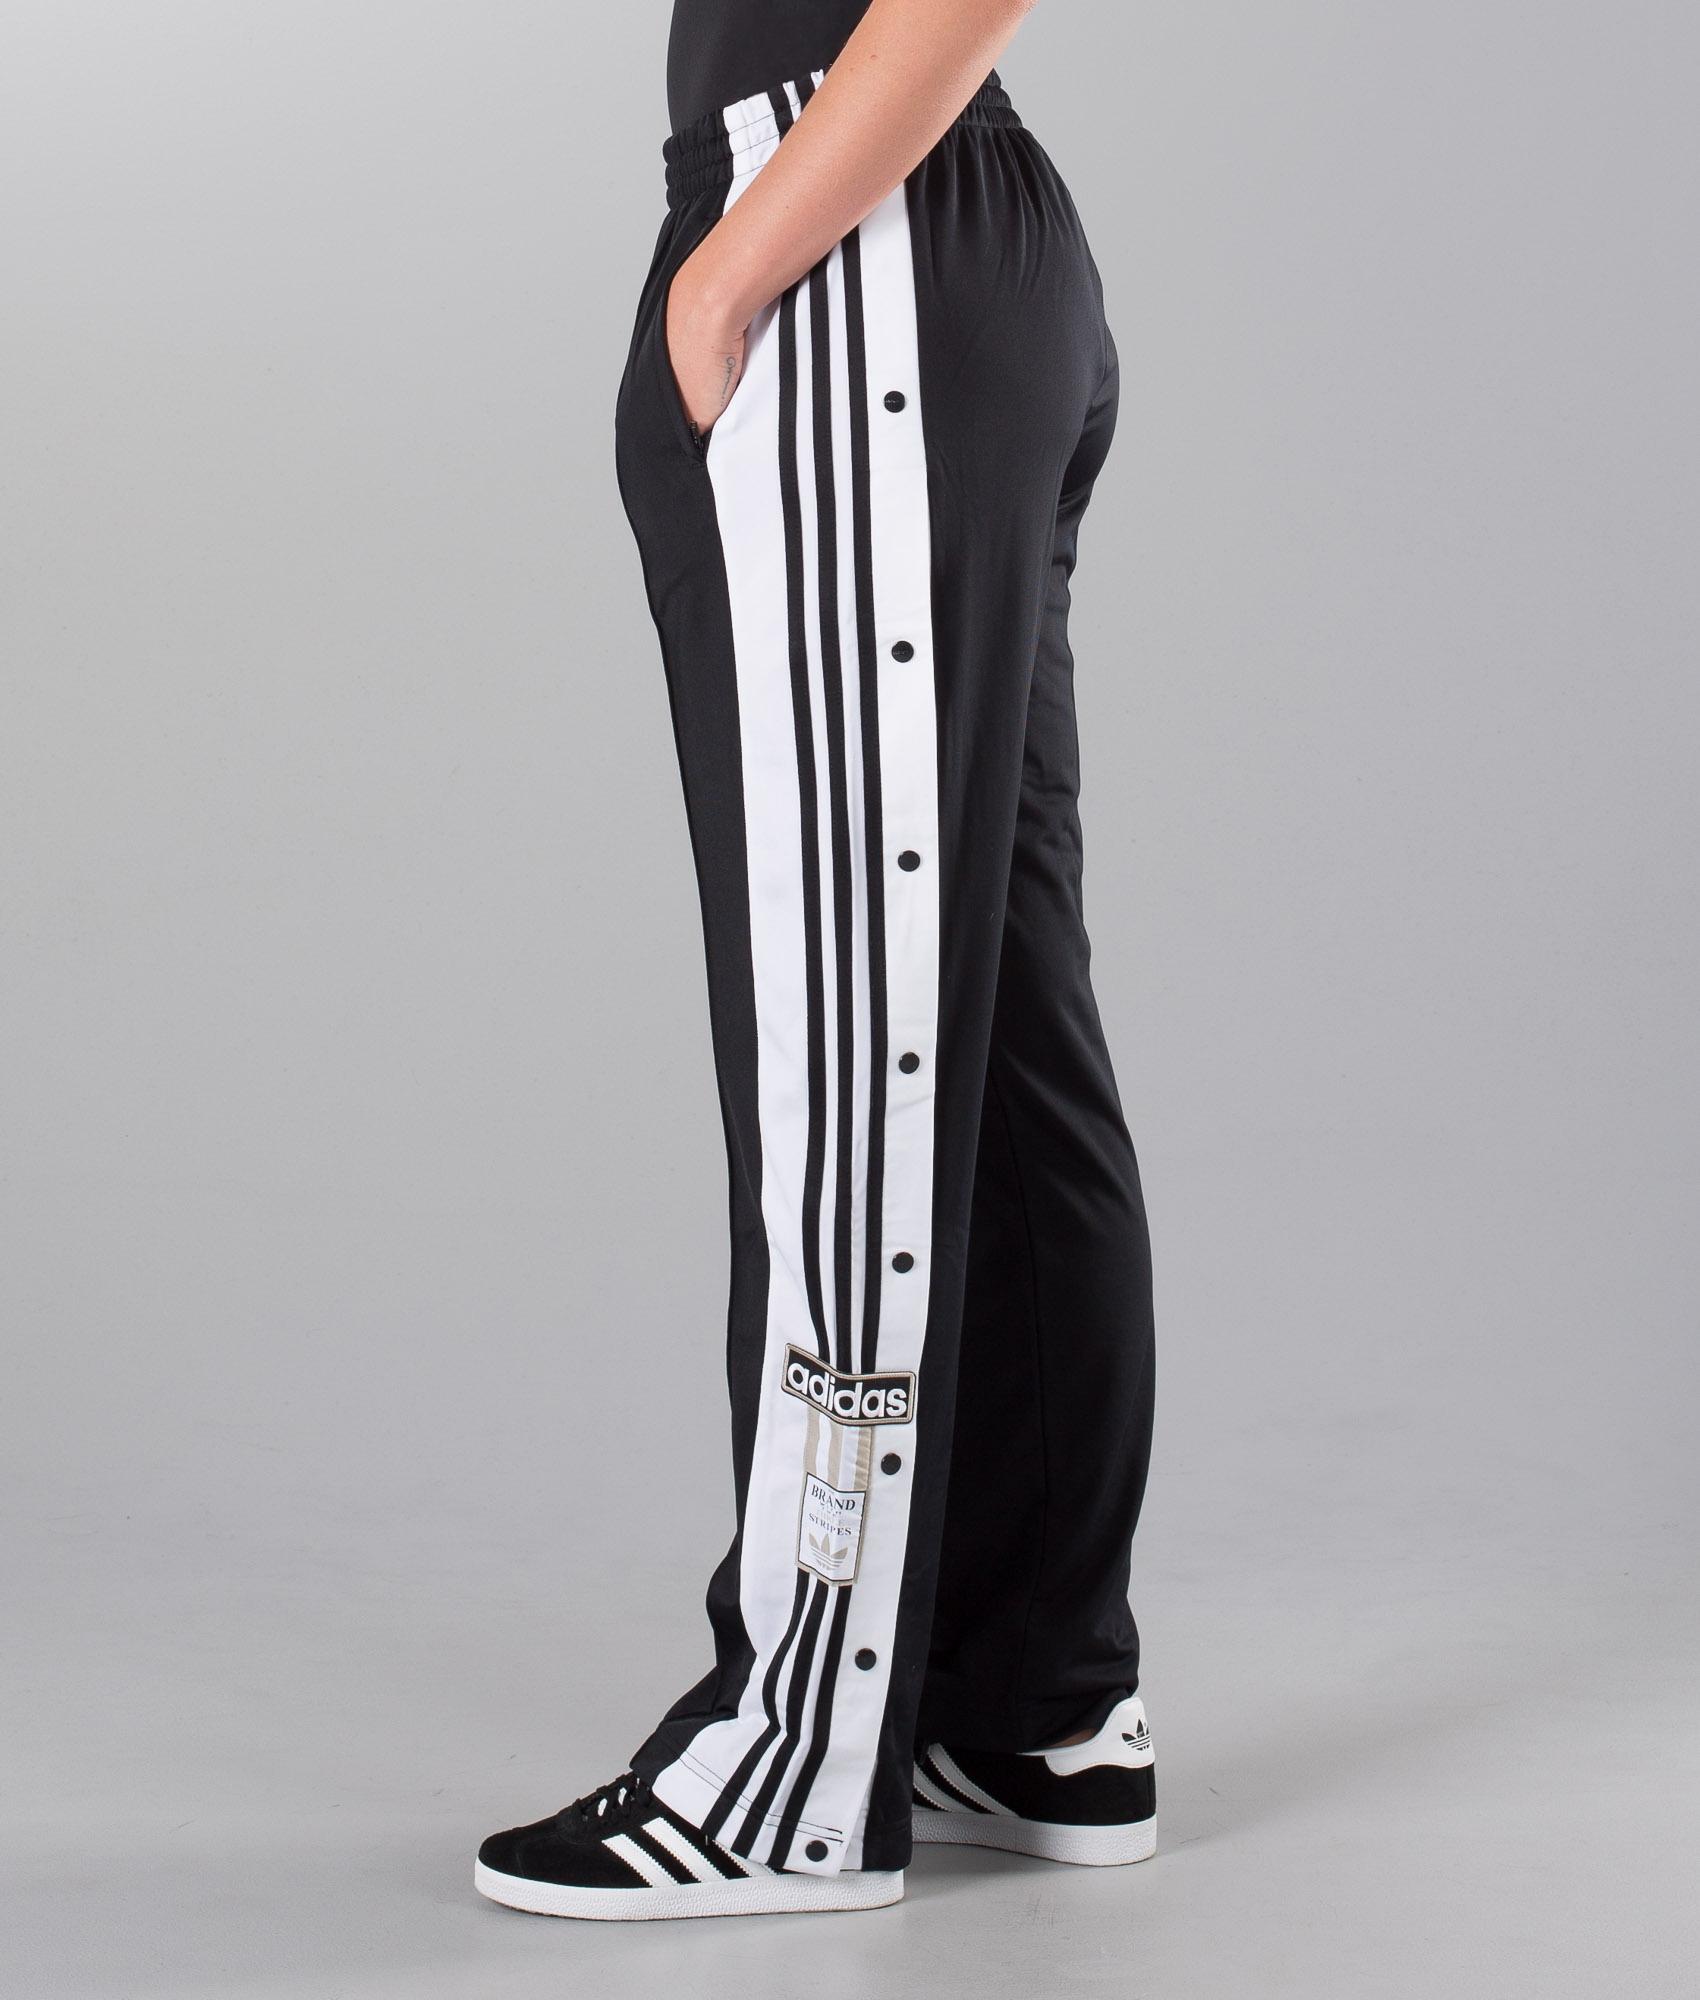 Adidas Originals Adibreak Housut BlackCarbon